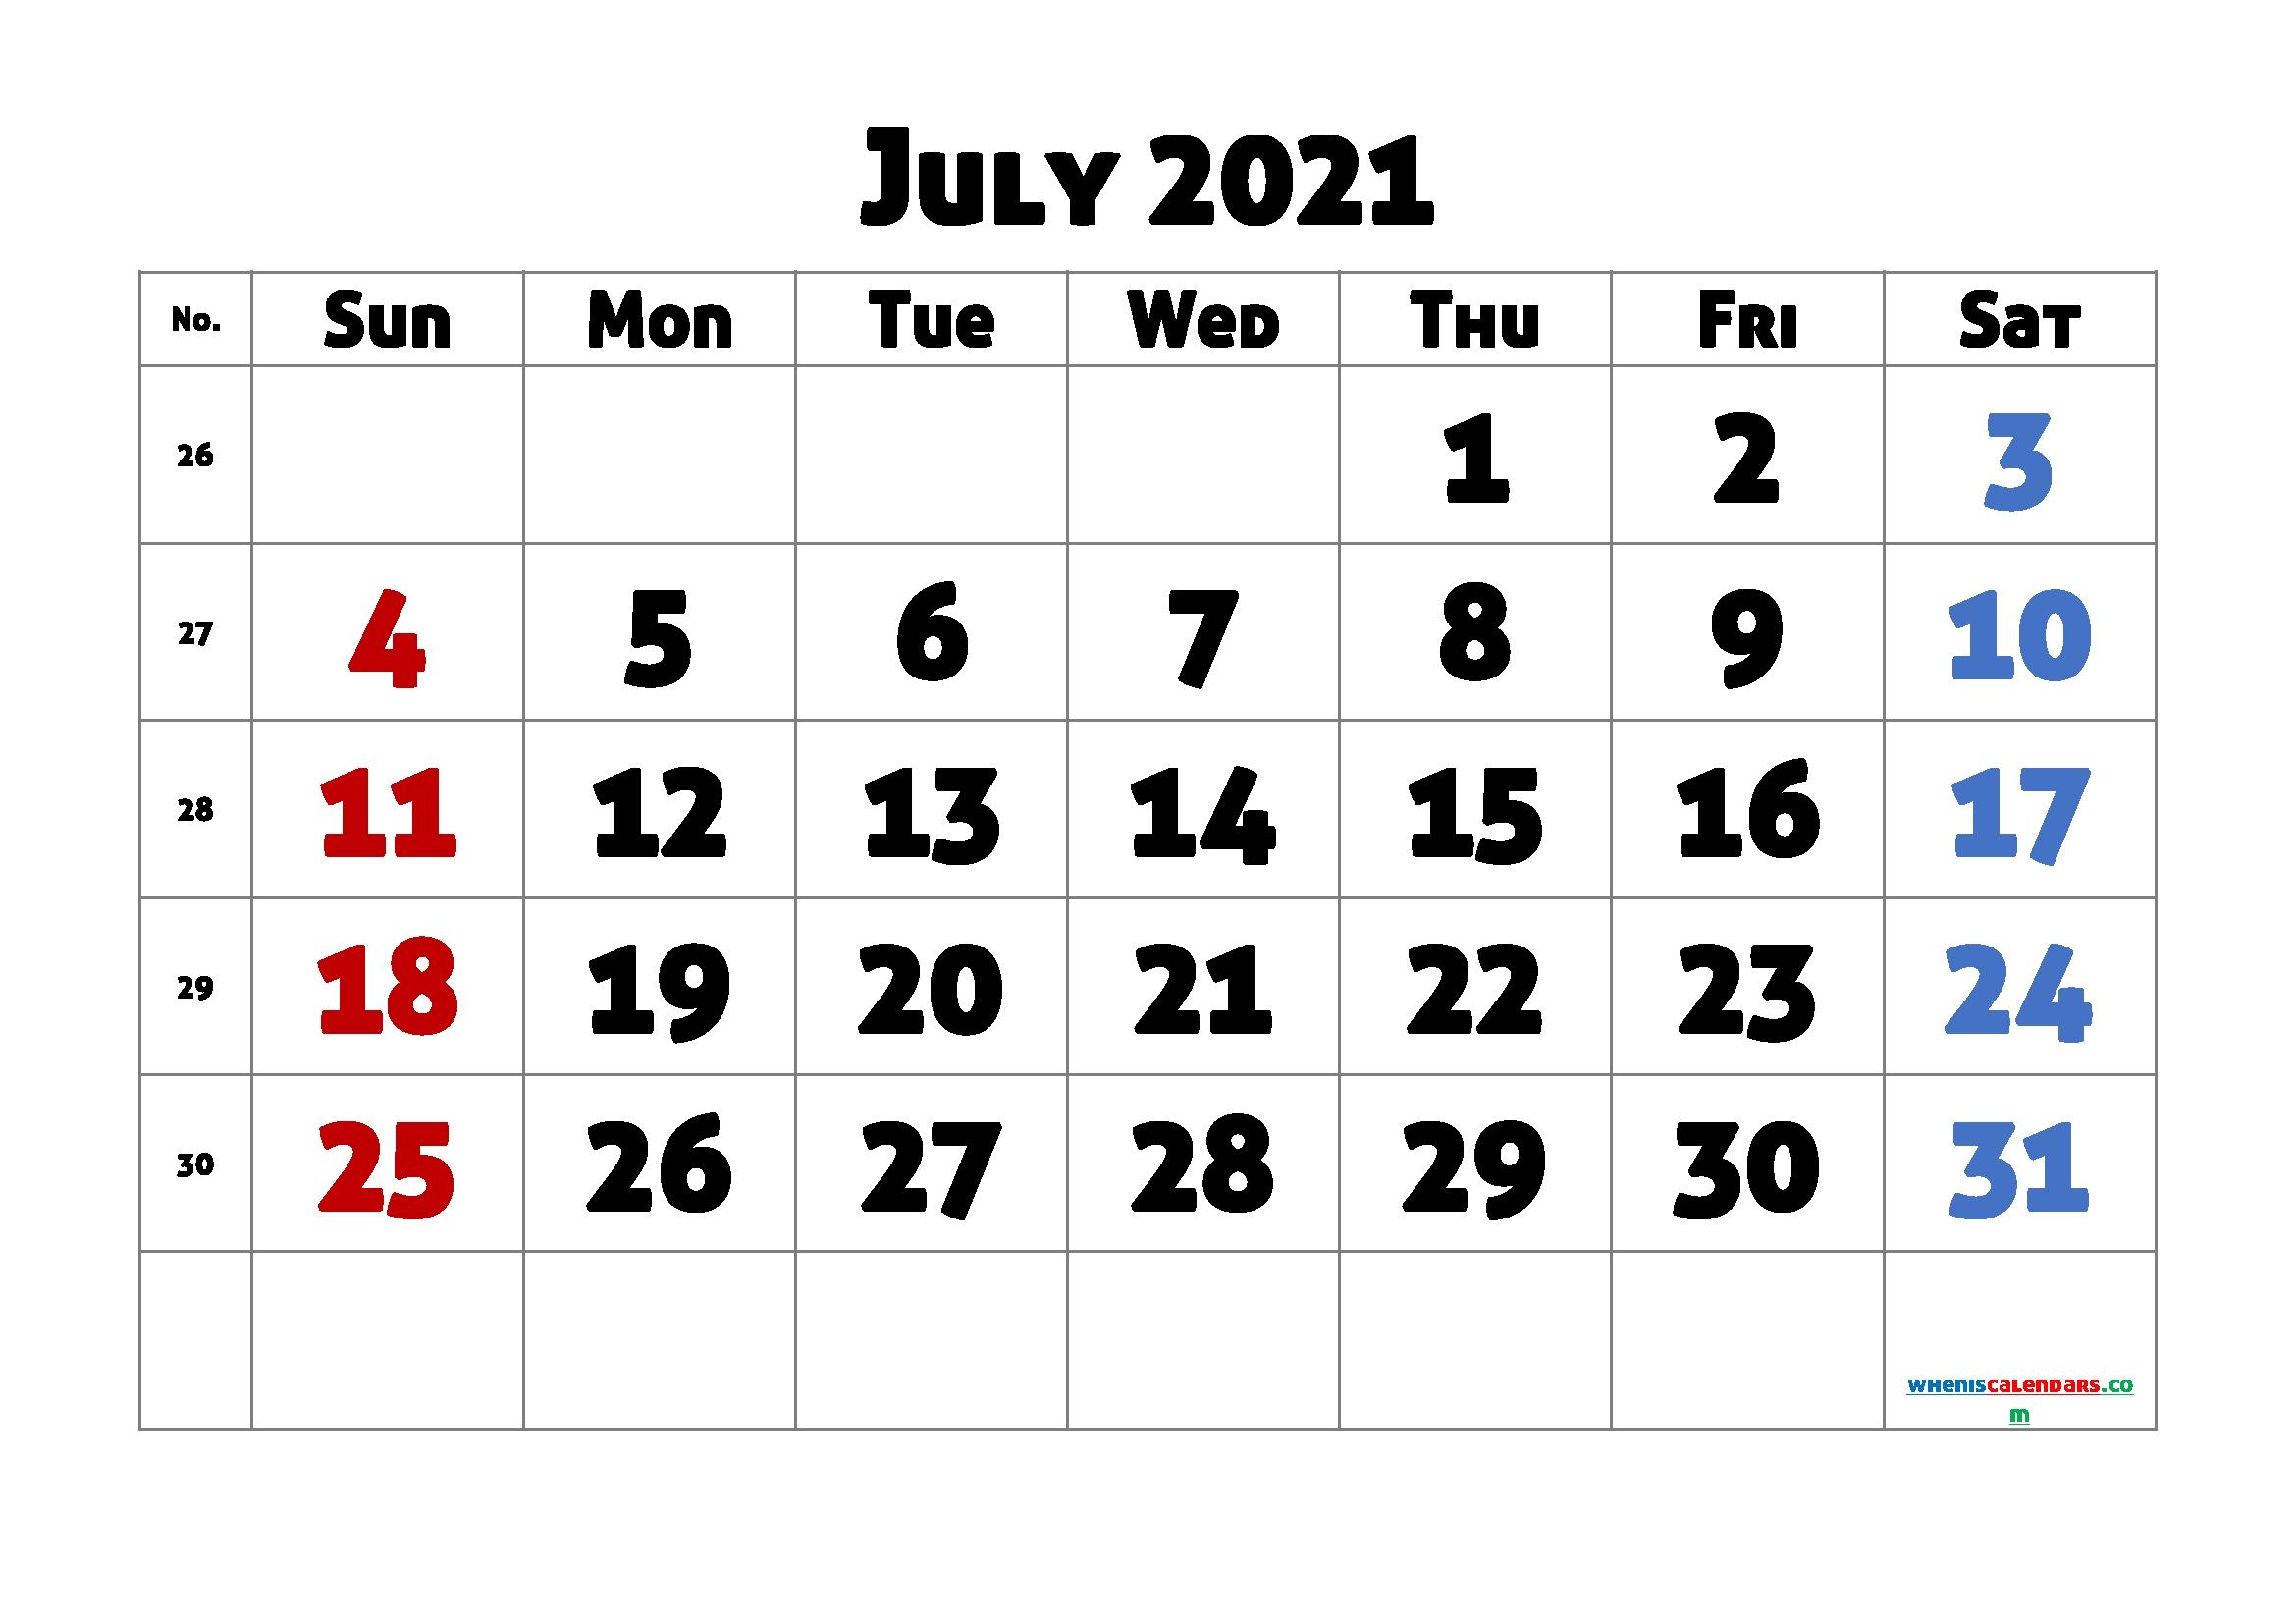 Free July 2021 Calendar Printable   Template M21Allerdisplay4 July 2021 Tithi Calendar